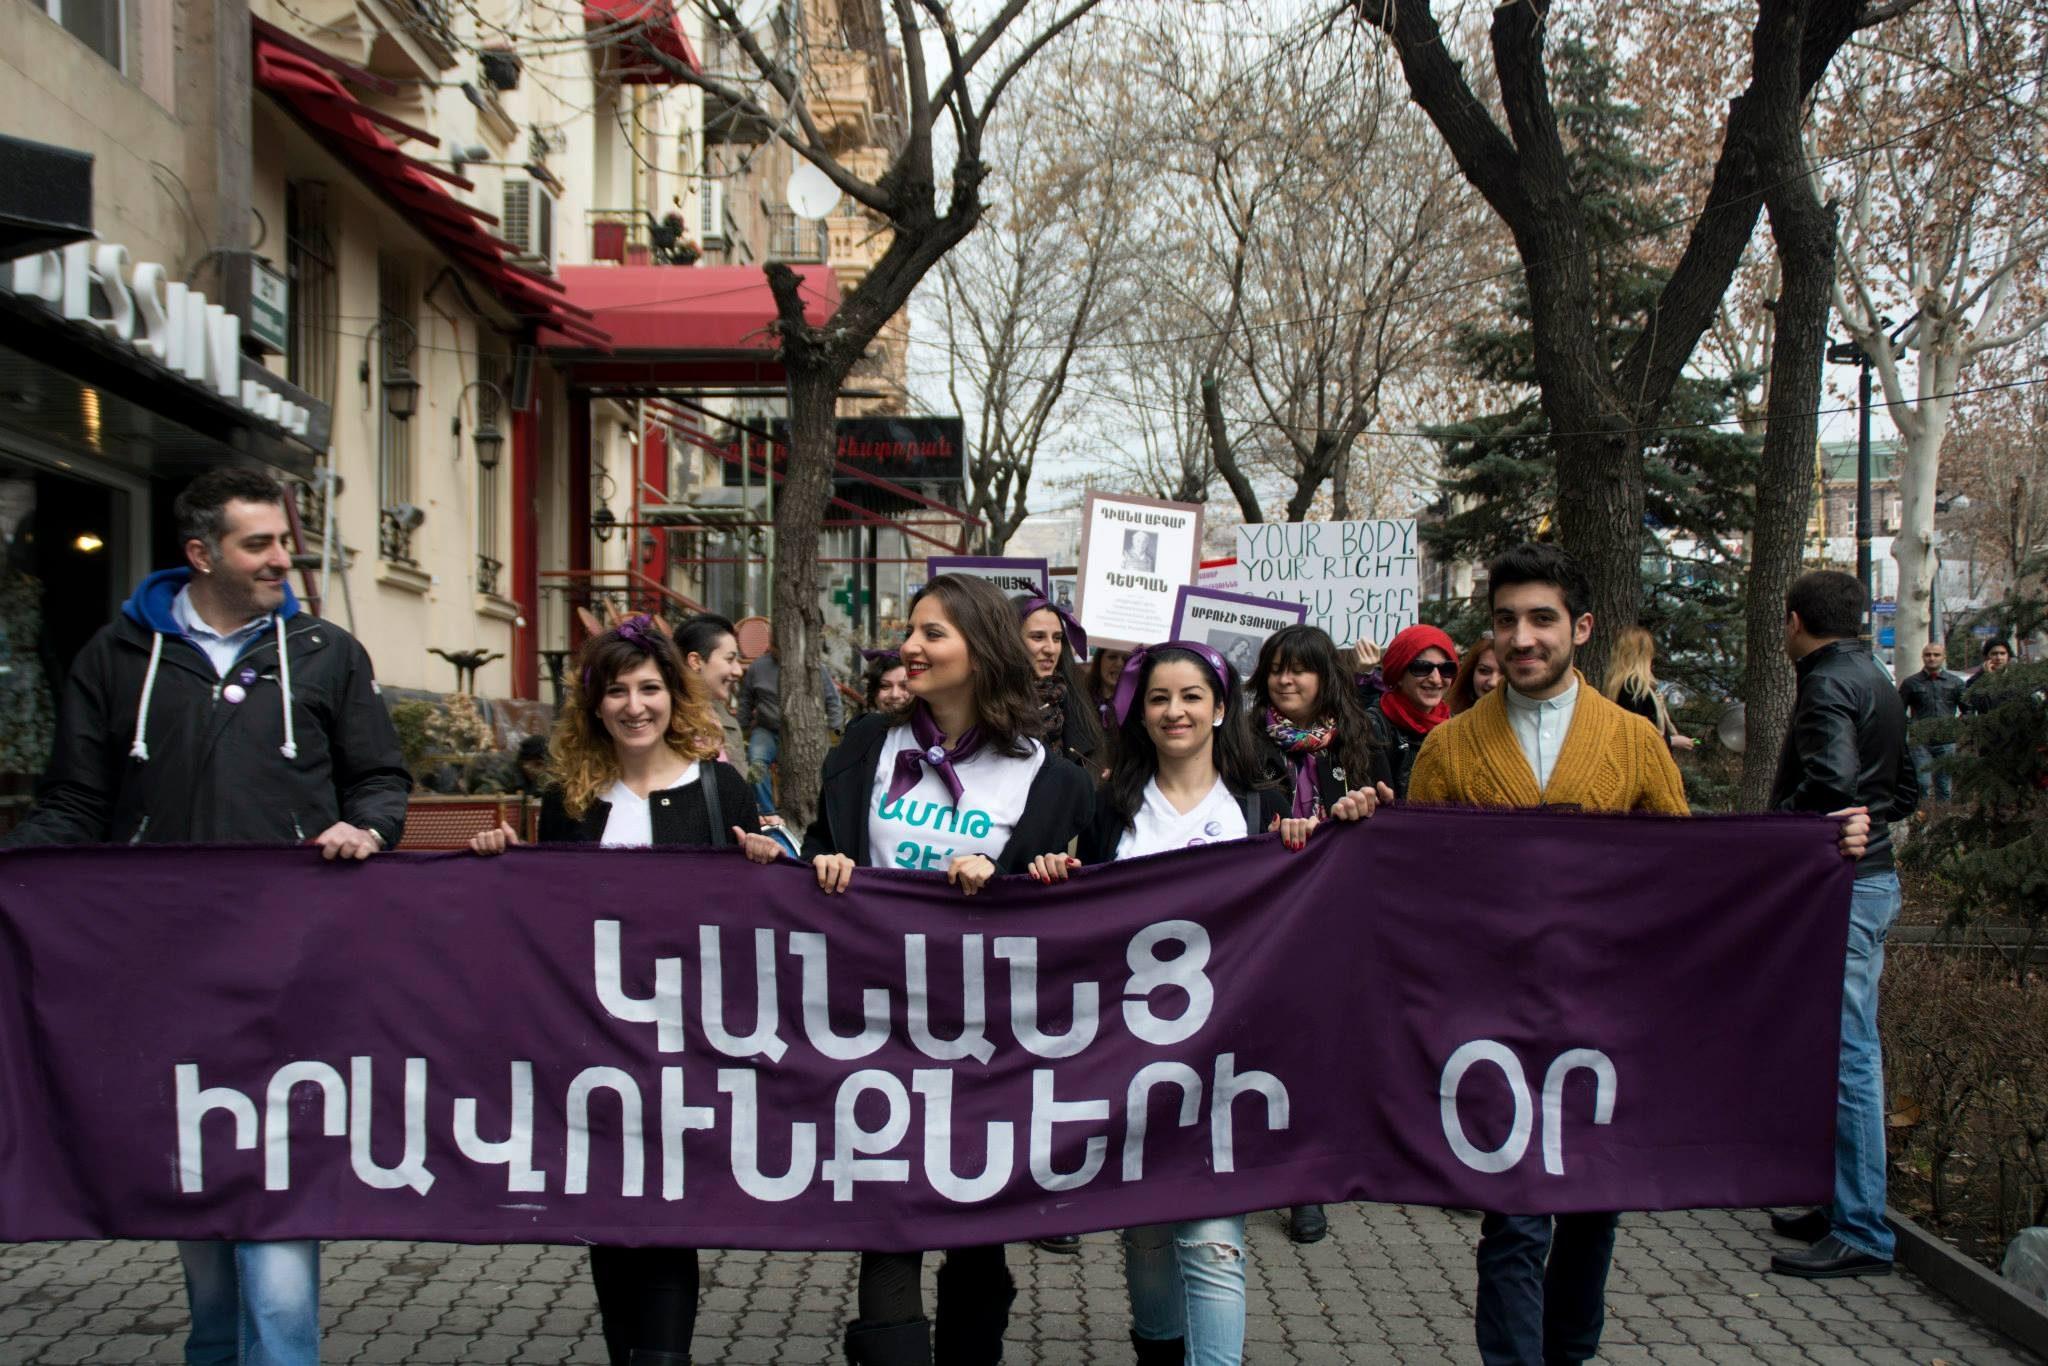 Rom Danial, Lida Minasyan, Lilly Minasyan, Perchuhy Kazhoyan, Lala Aslikyan and Kamo Davtyan of the Women's Resource Center at an 8 March demonstration in Yerevan. Photo: Petra Hultman